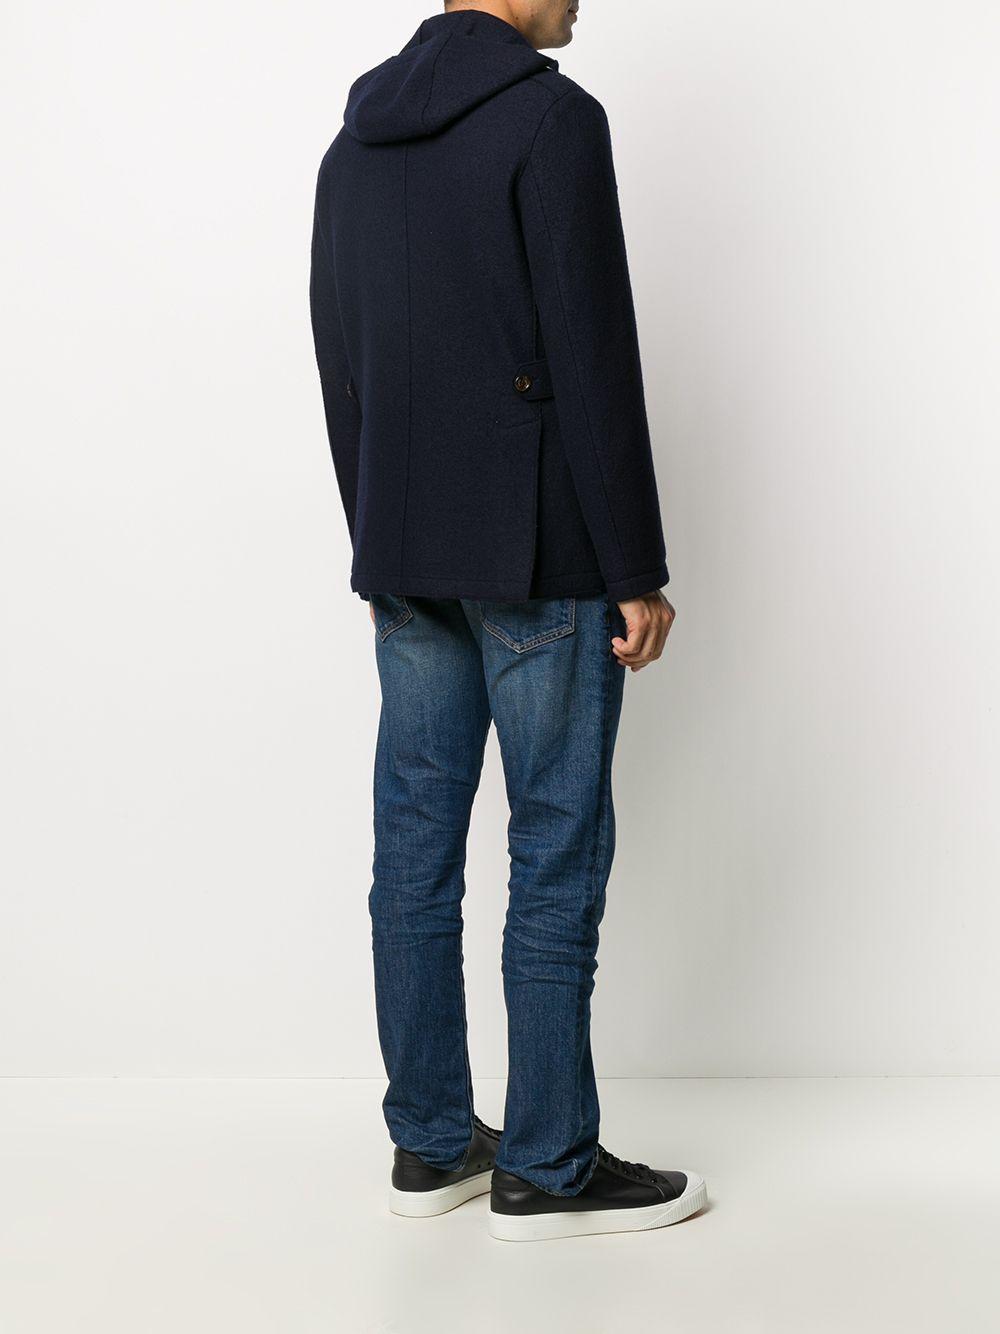 Giacca militare in lana vergine blu ELEVENTY | Giacche | B70GIAB02-CAS2400419